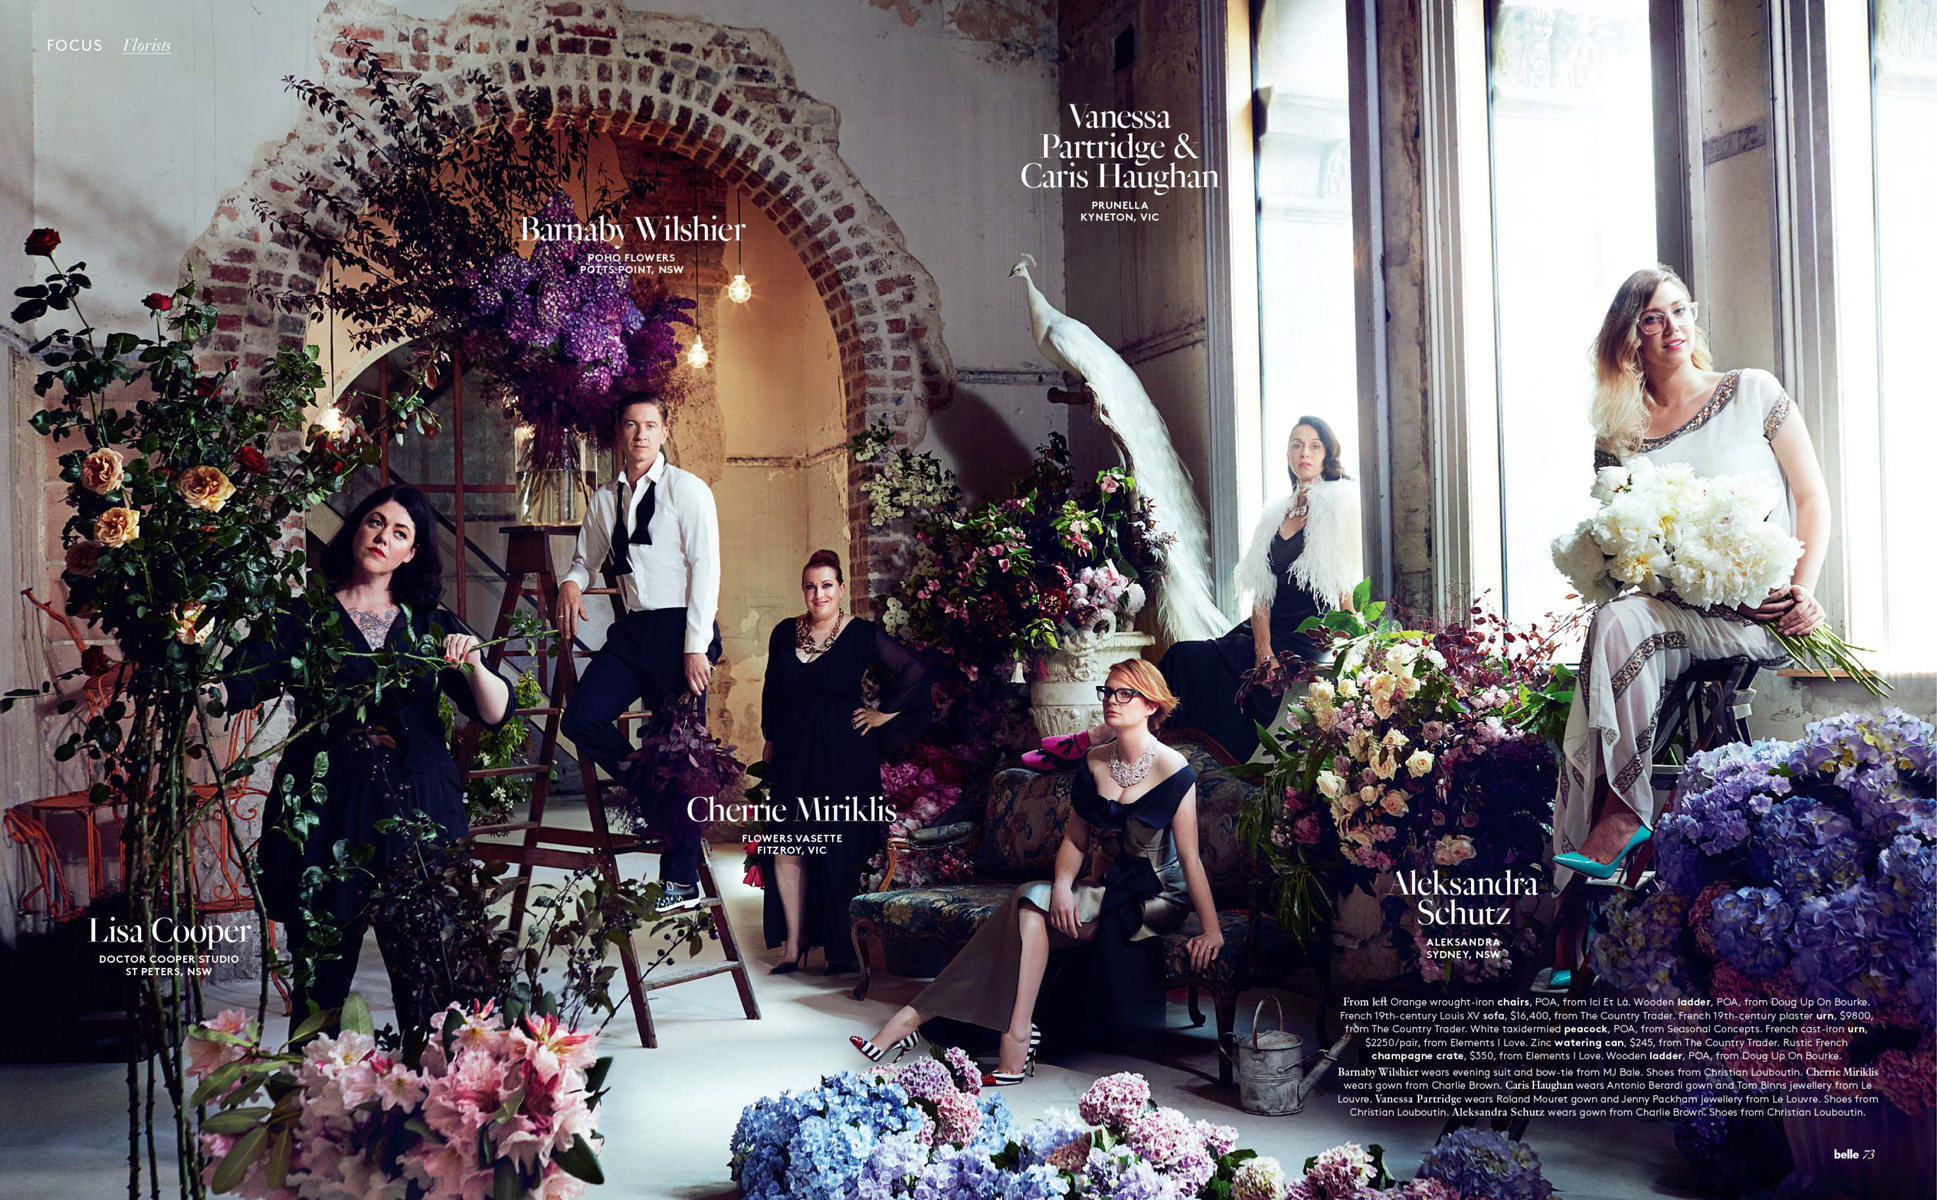 Belle-Feb-March-2014,-Florist-Focus-2.jpg